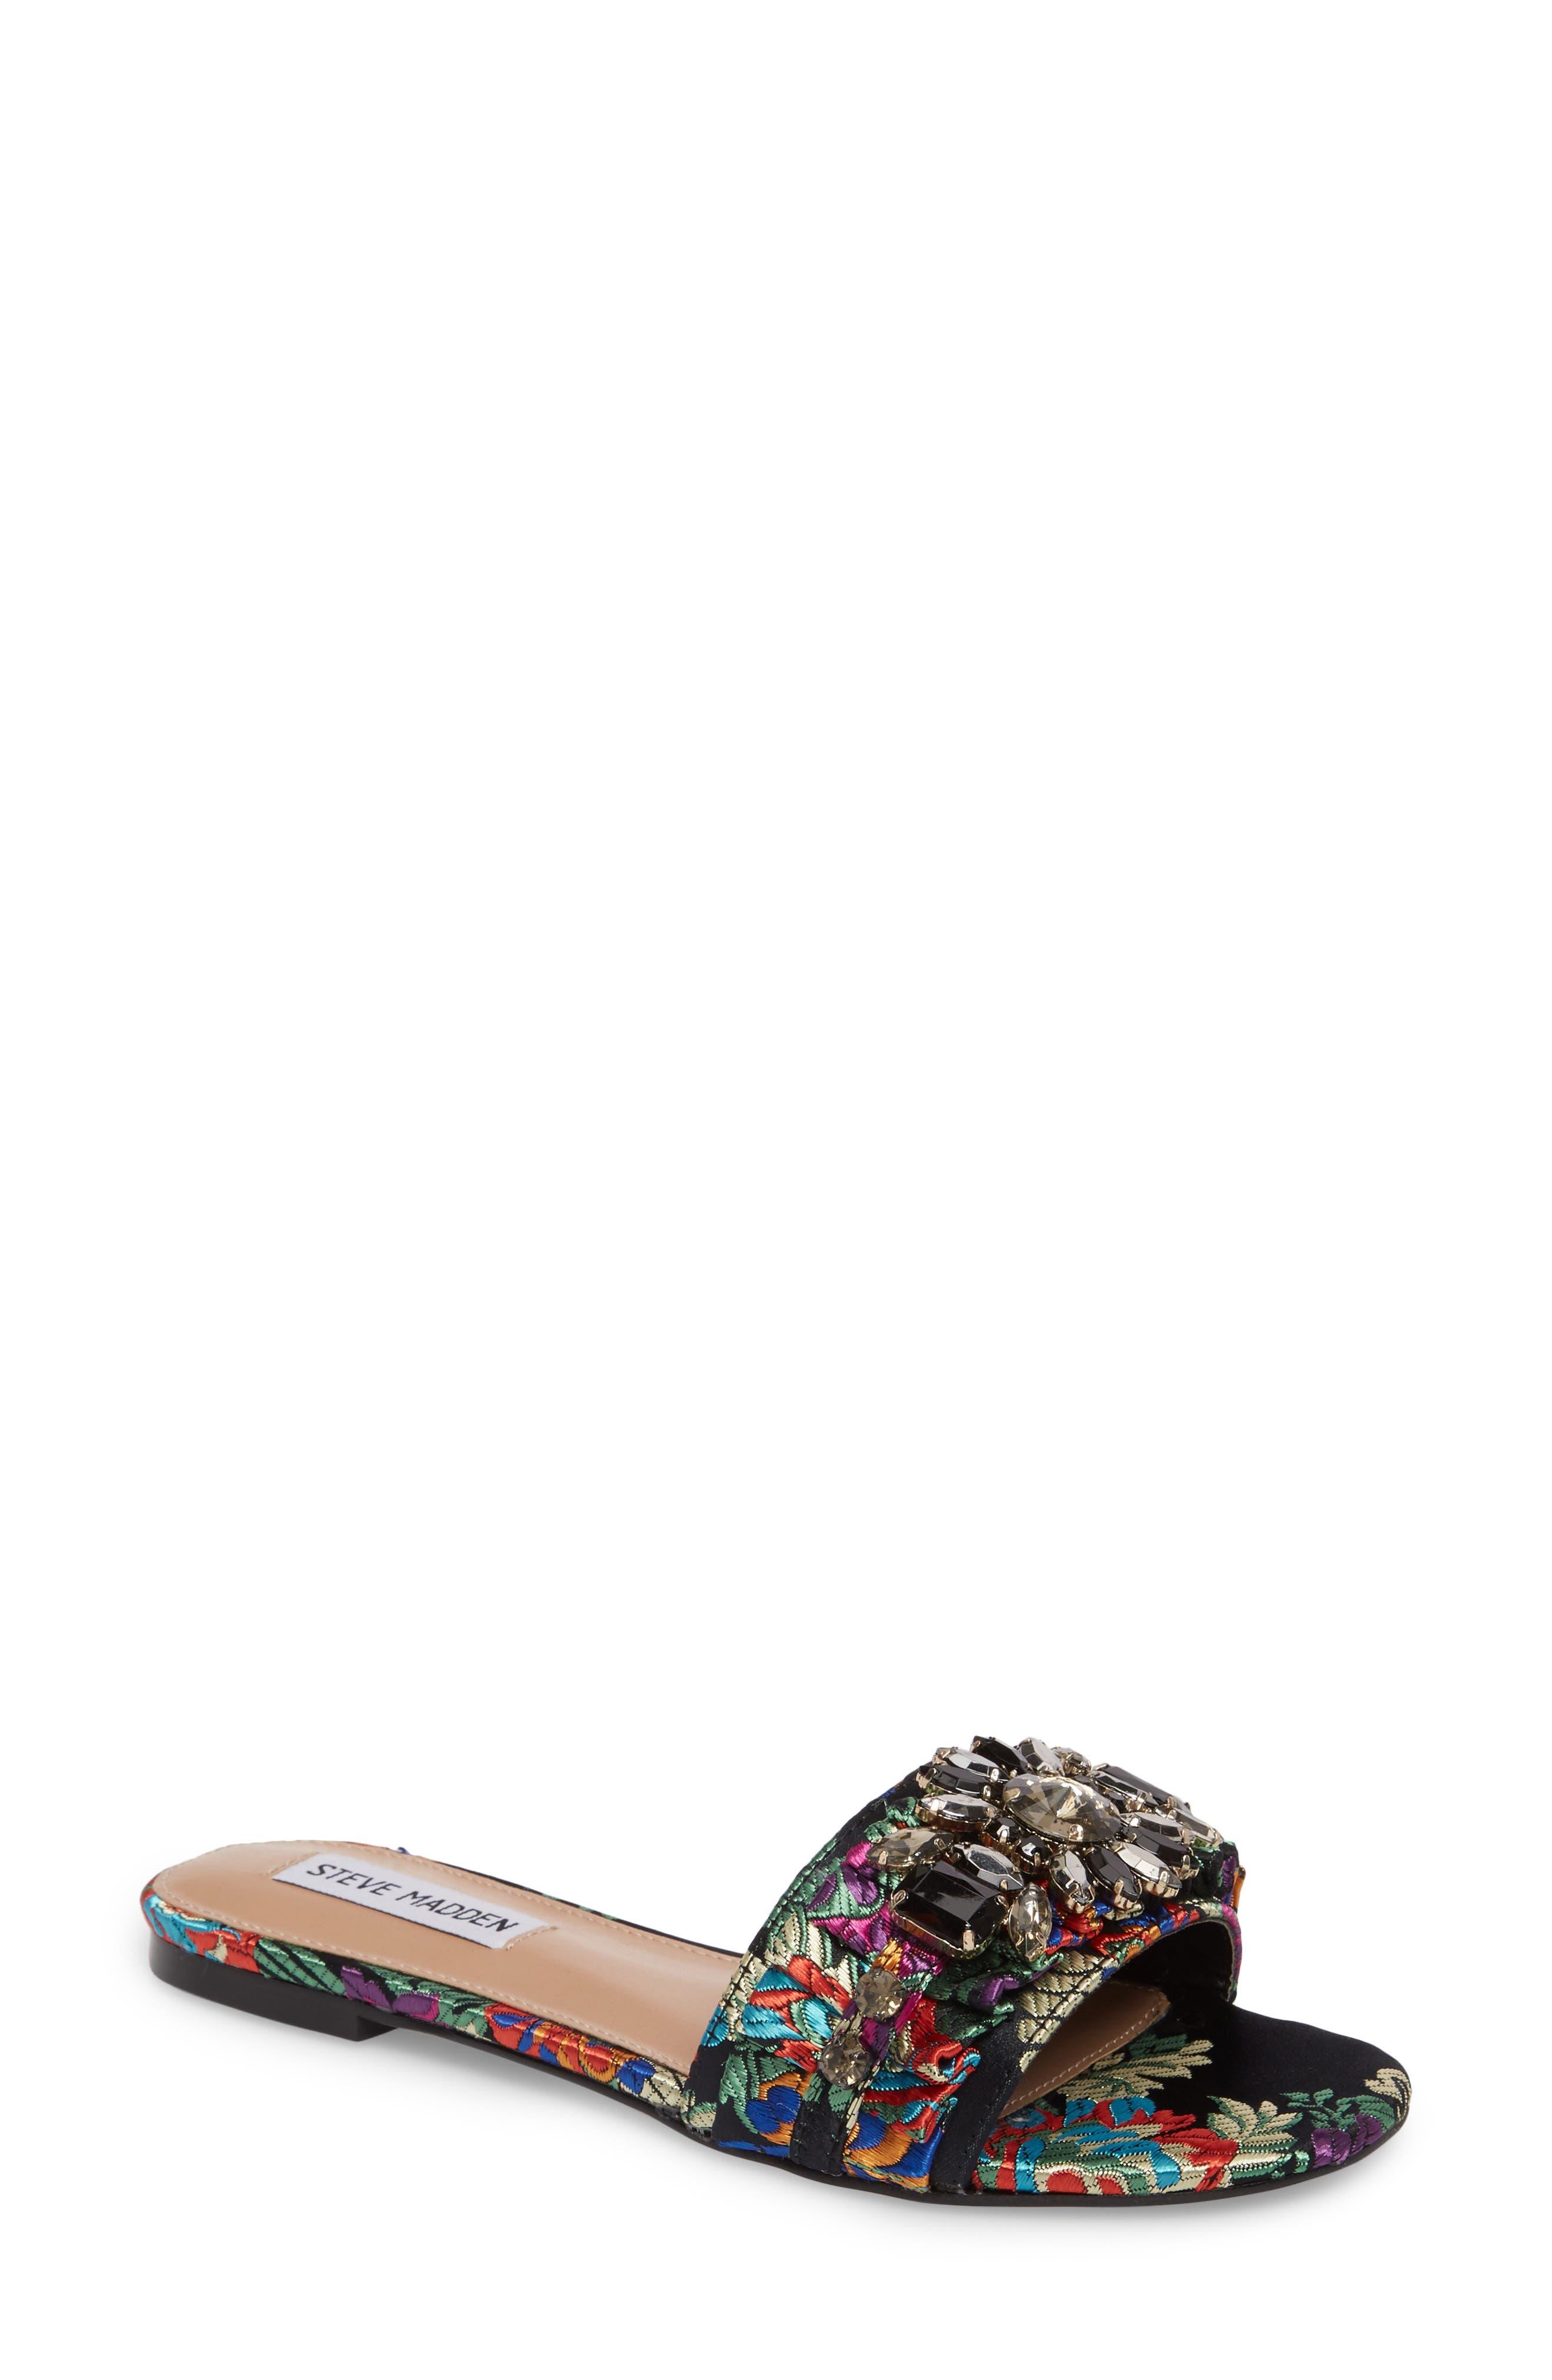 Pomona Crystal Embellished Slide Sandal,                             Main thumbnail 1, color,                             Black Multi